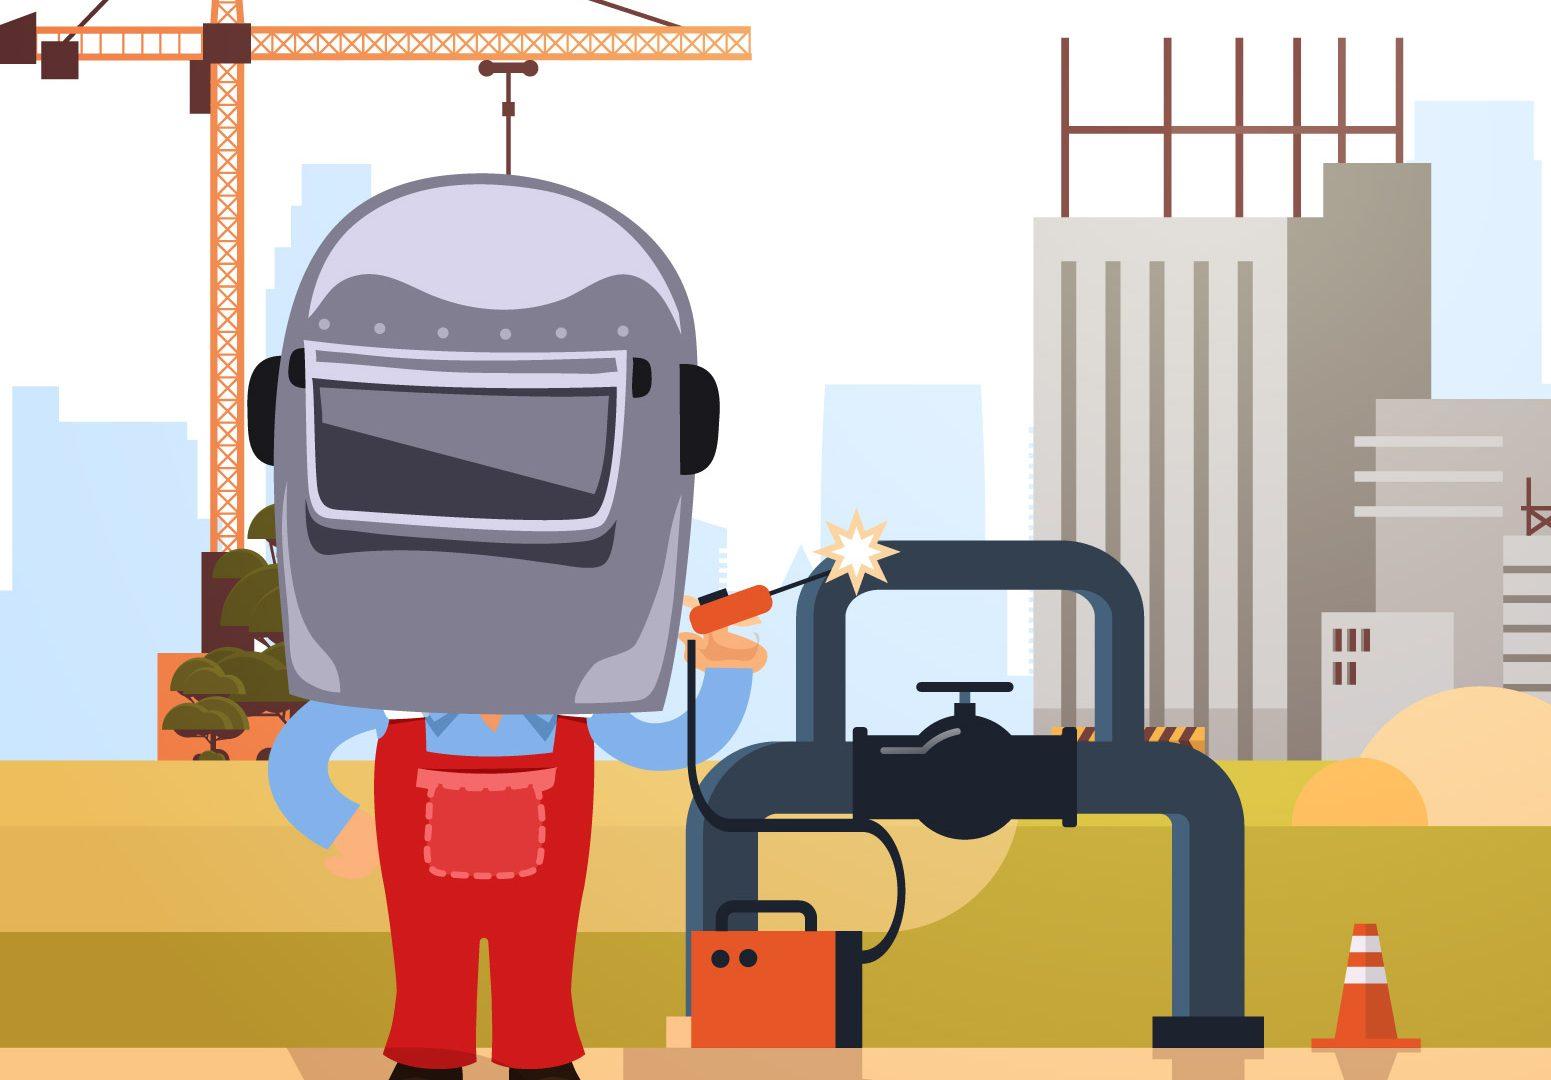 Local Exhaust Ventilation Regulations - COSHH Regulation 9